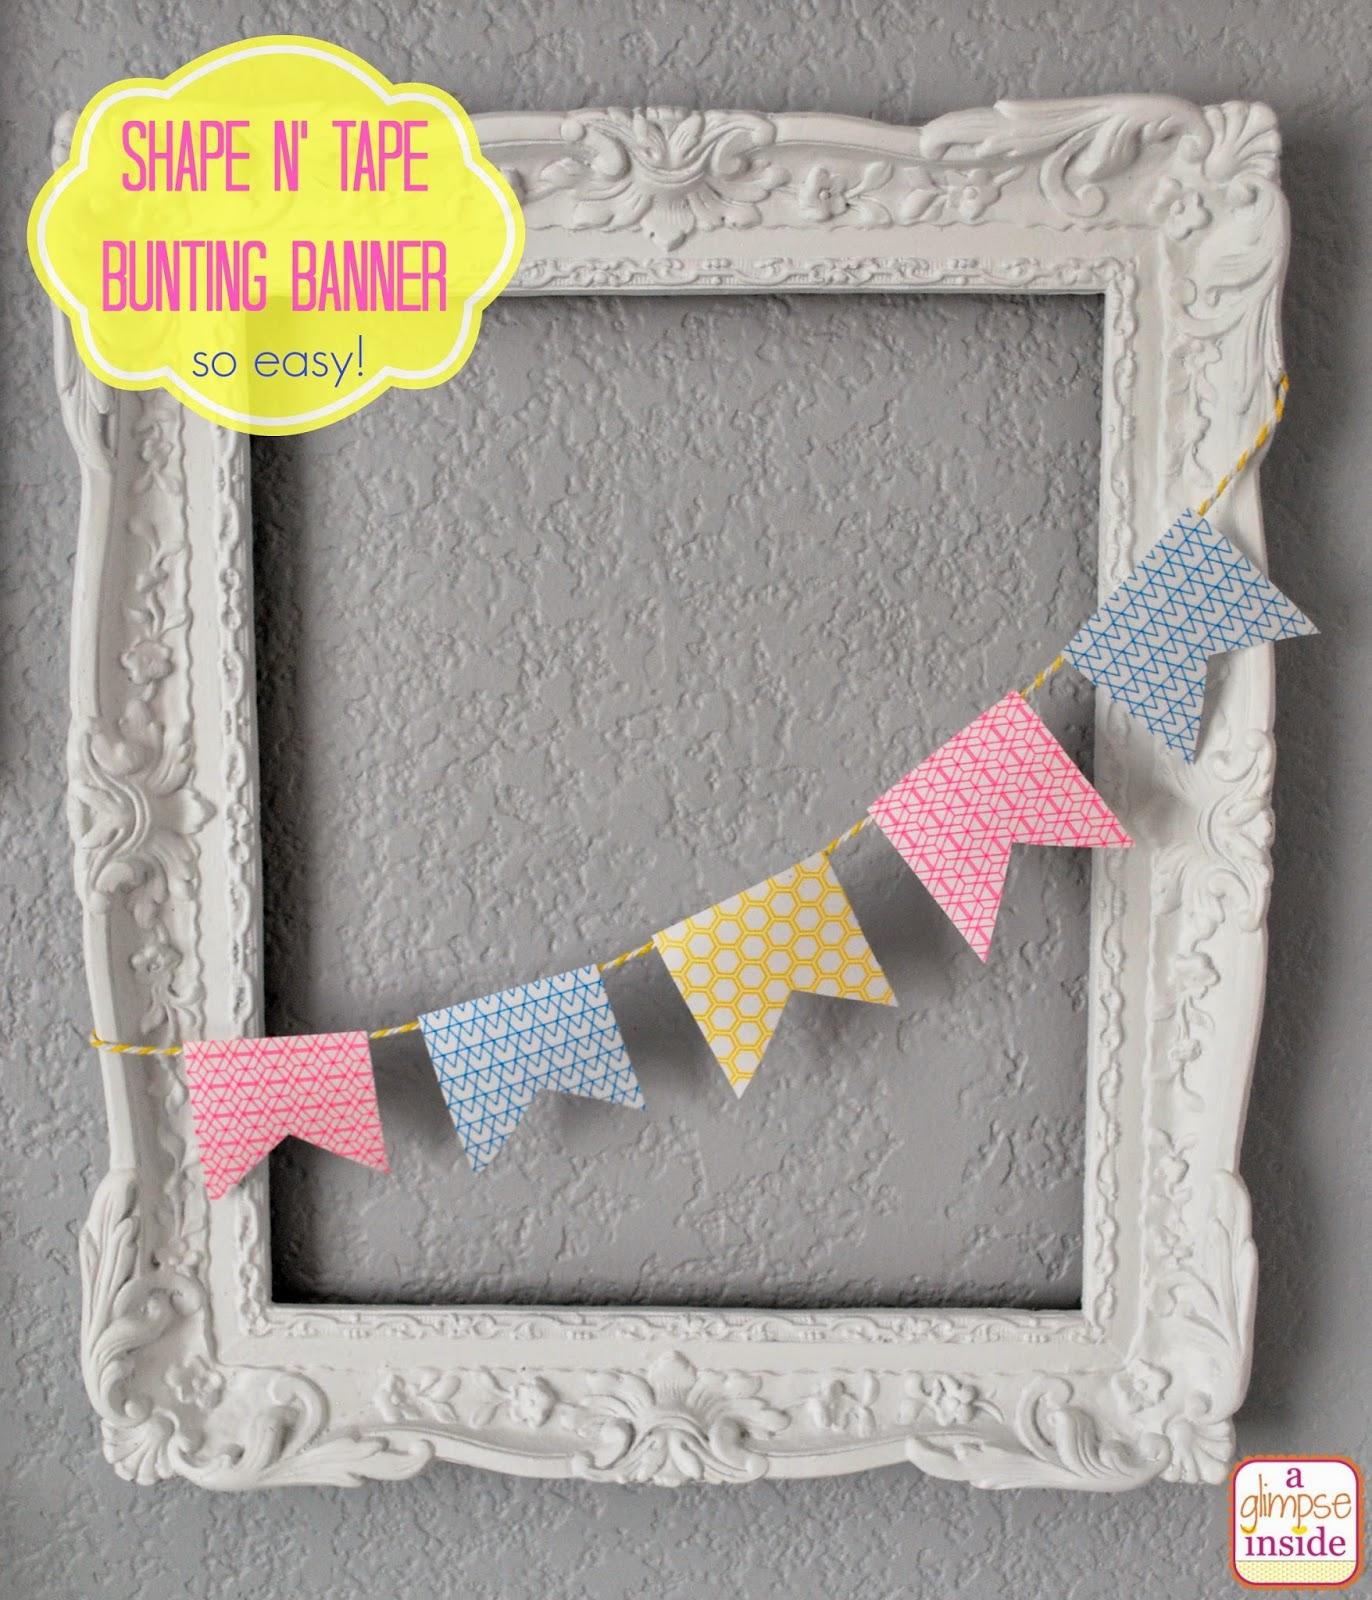 http://www.aglimpseinsideblog.com/2014/05/easy-shape-n-tape-bunting-banner.html